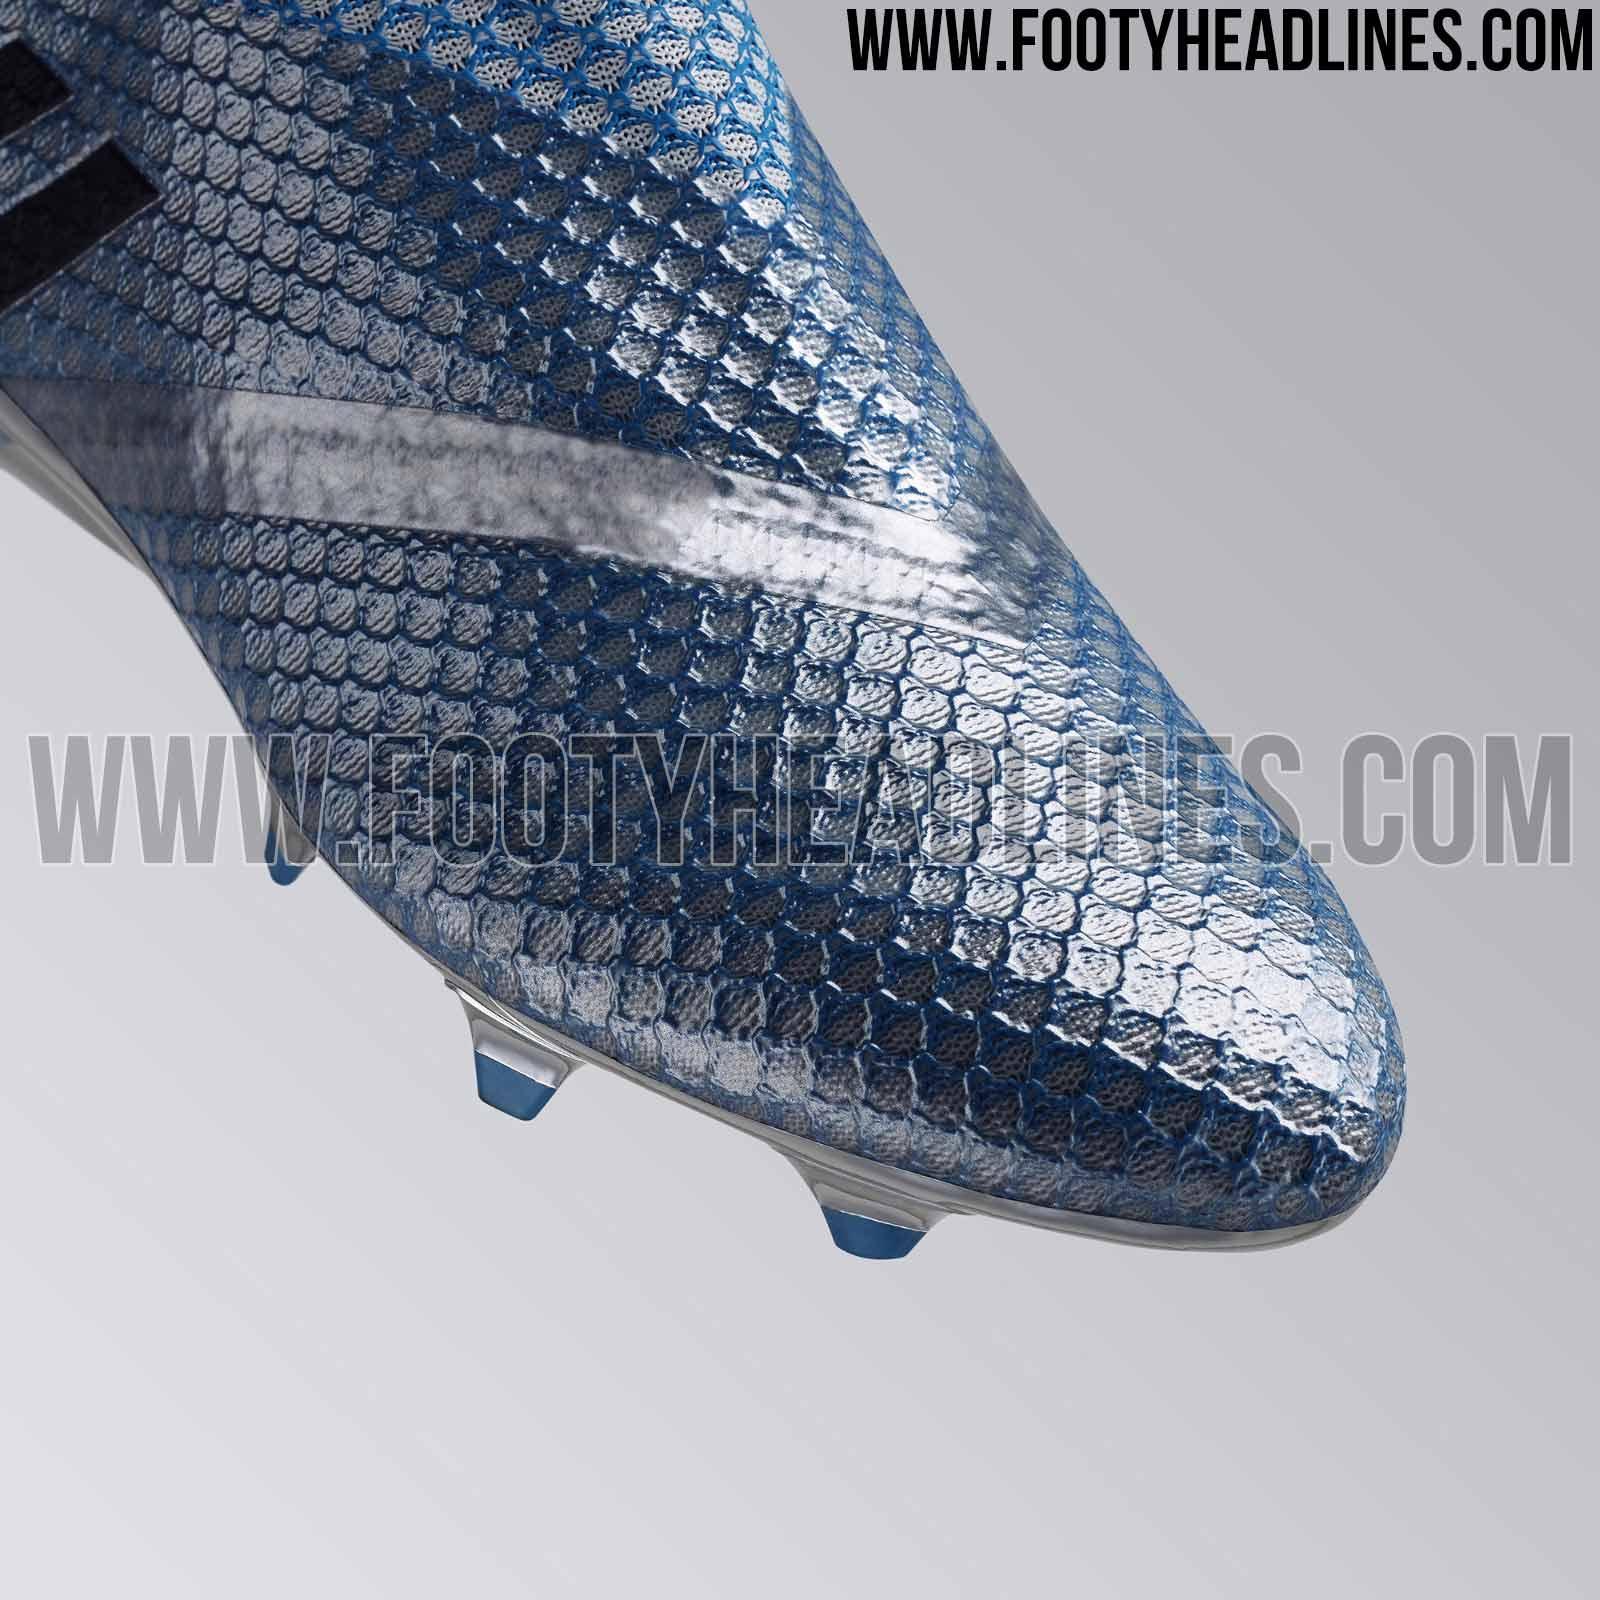 adidas Messi 16 Pureagility Black Black (OUT OF STOCK)